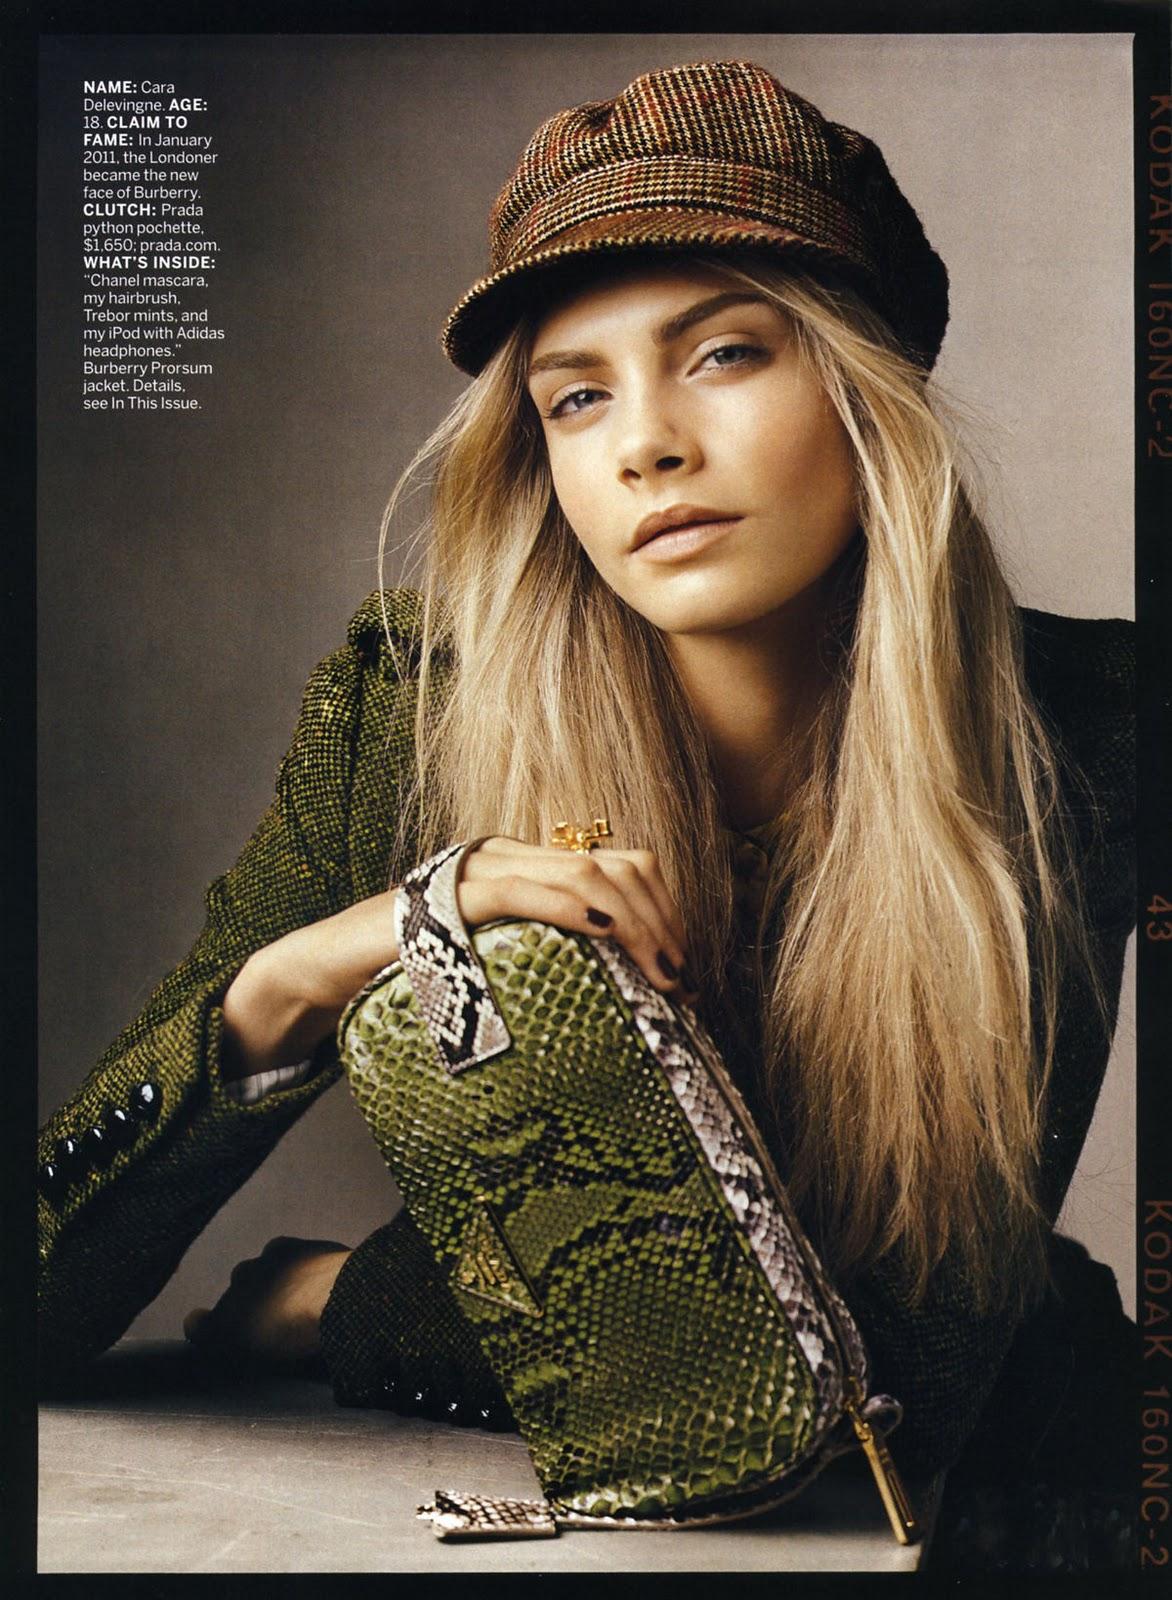 http://3.bp.blogspot.com/-KSTSC4K4XyA/TnYSfnPyqLI/AAAAAAAABbw/4MZwMnLdnRM/s1600/Vogue-USA-July-2011-Lily-Aldridge-02.jpg